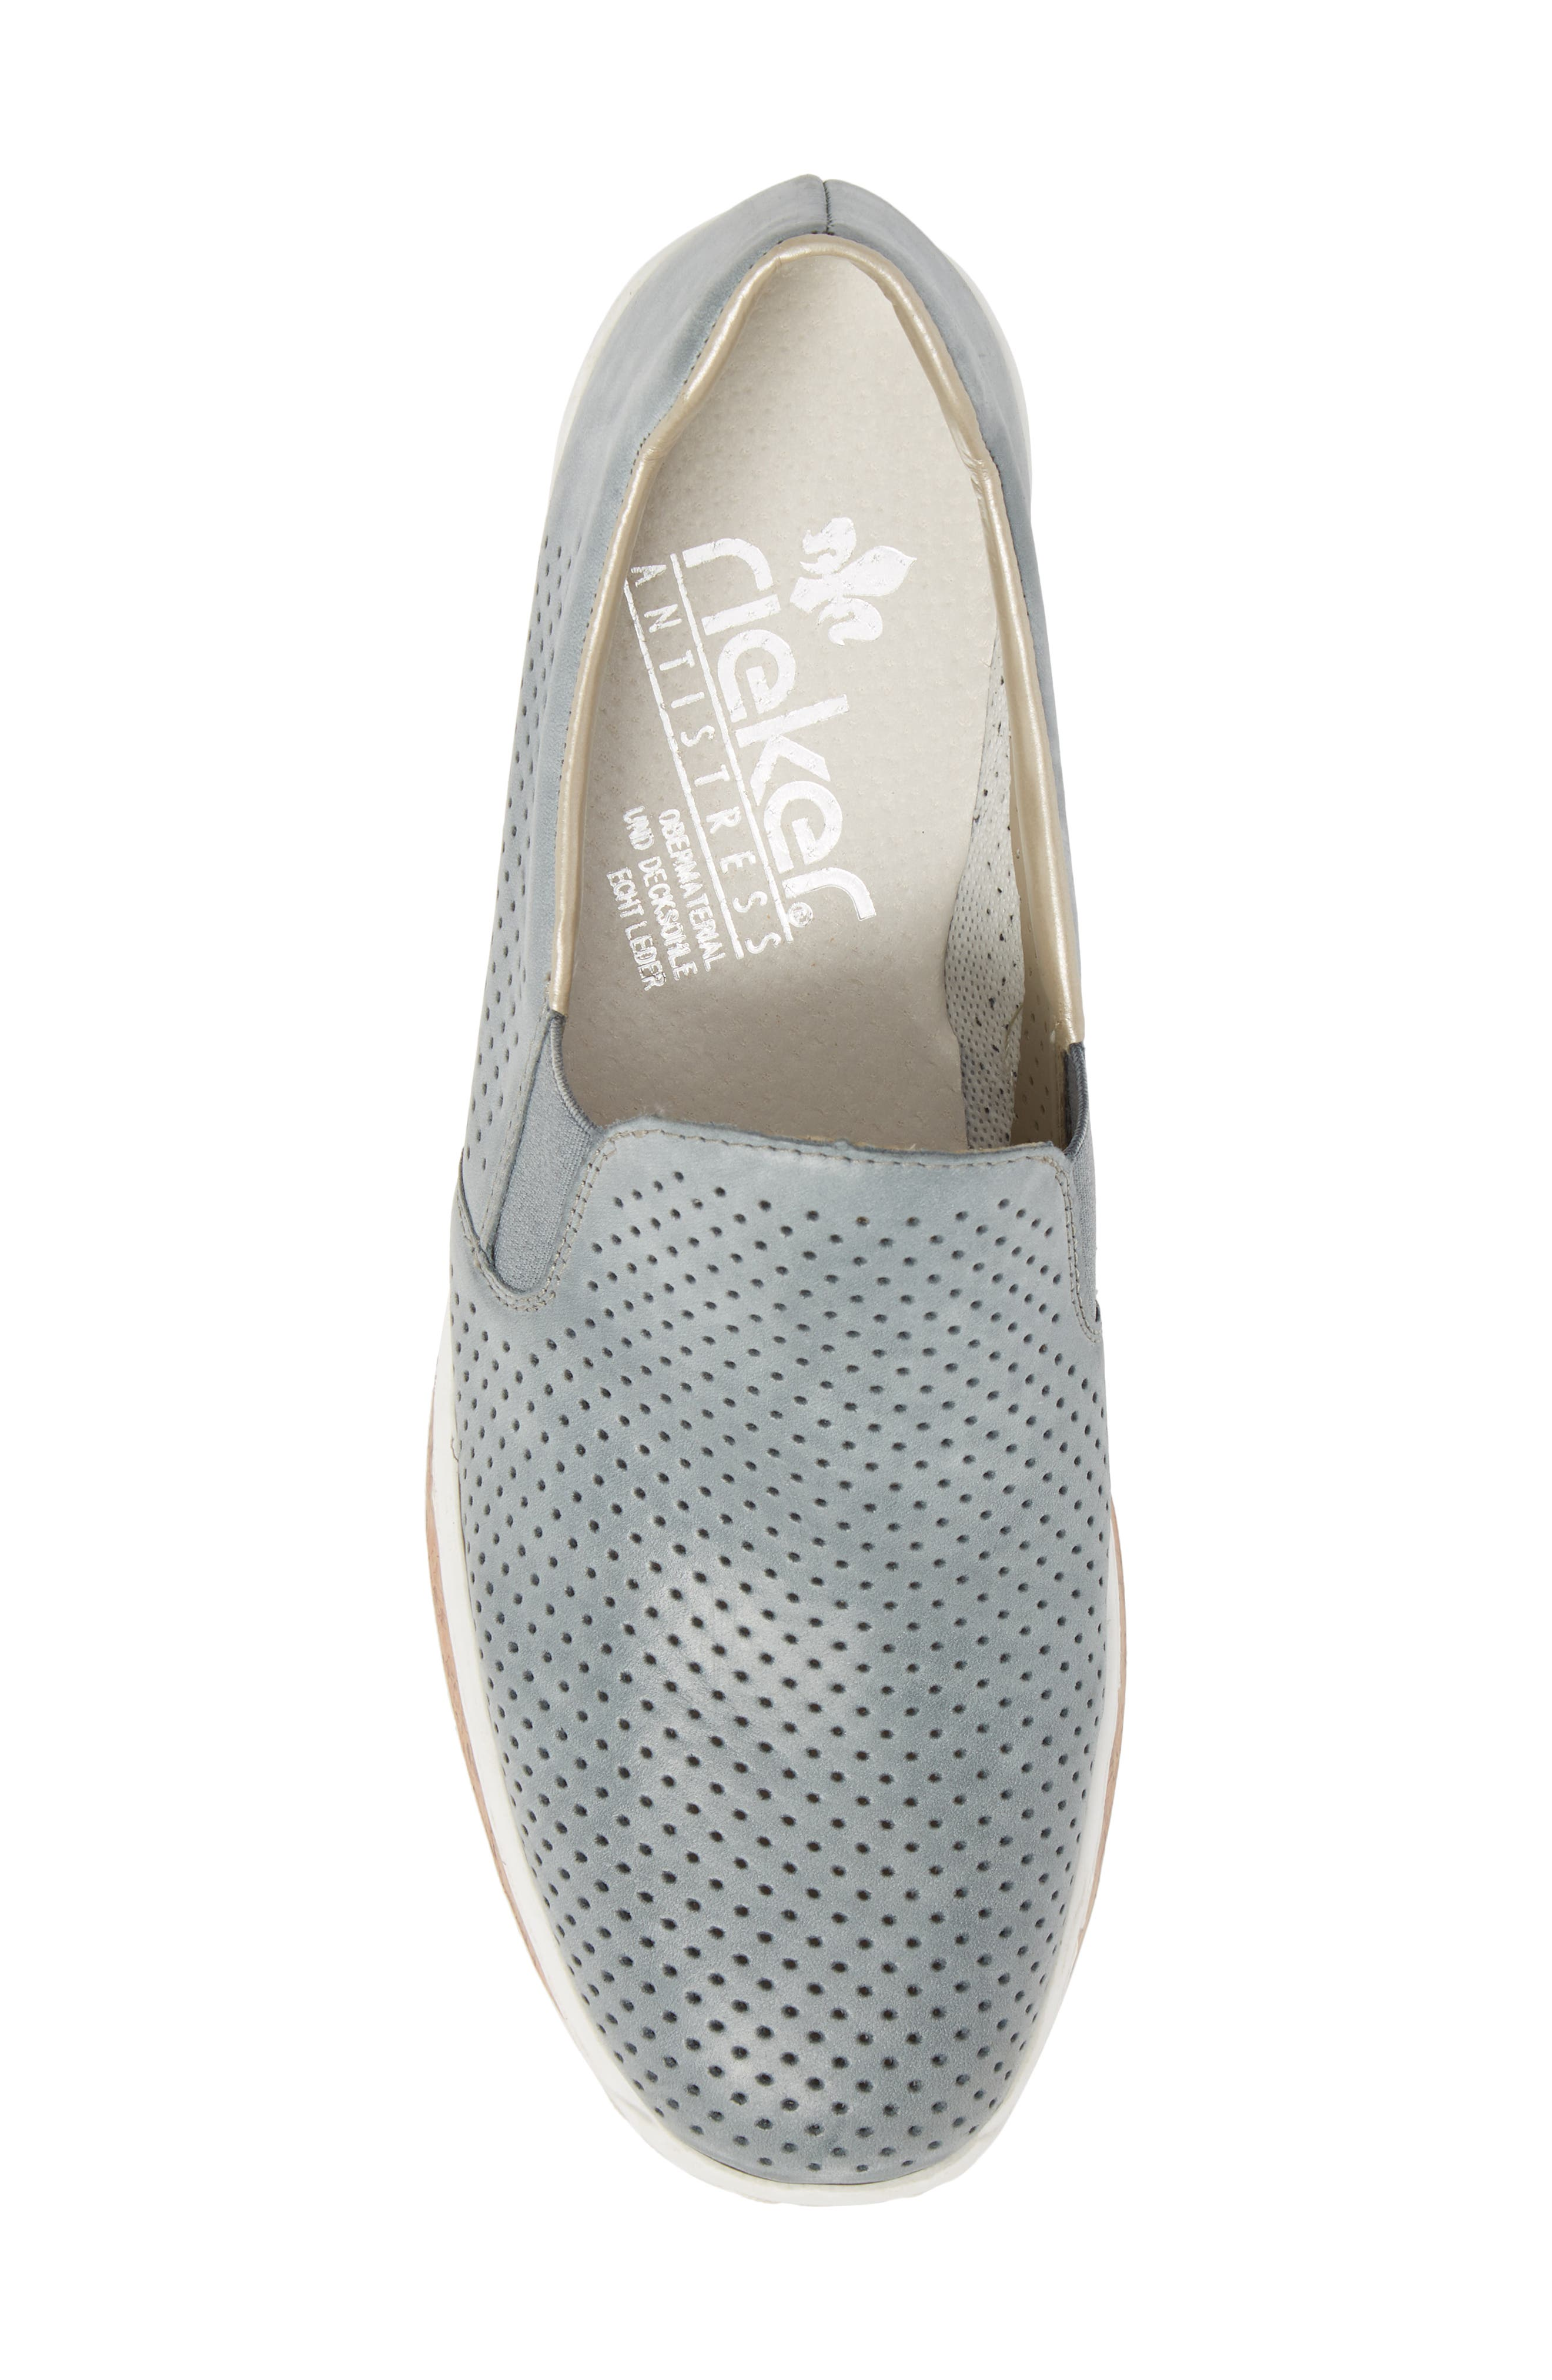 Doris 75 Wedge Sneaker,                             Alternate thumbnail 5, color,                             Royal Faux Leather